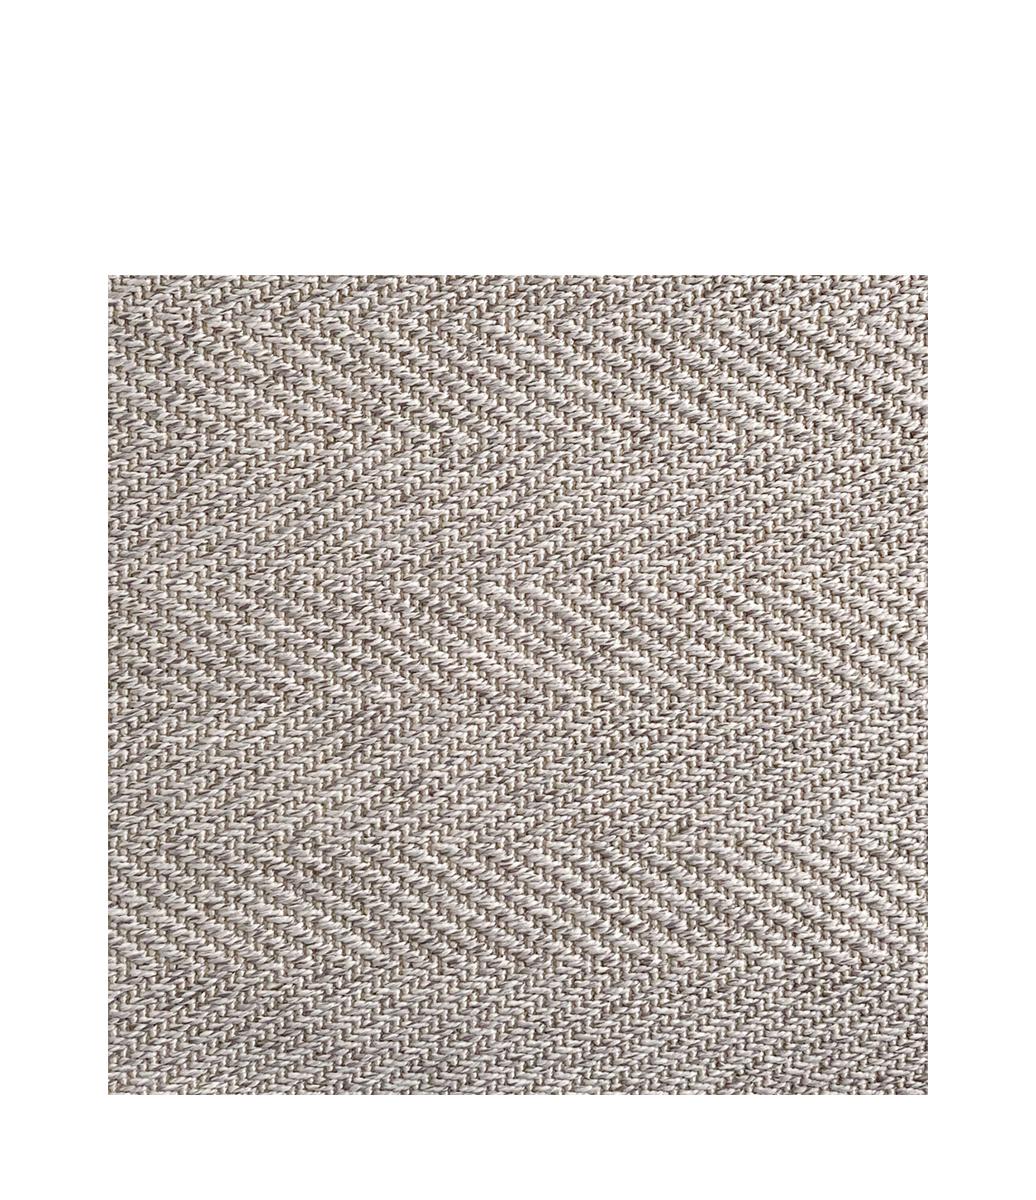 RIVIERA SAND Outdoor Carpet 2x3